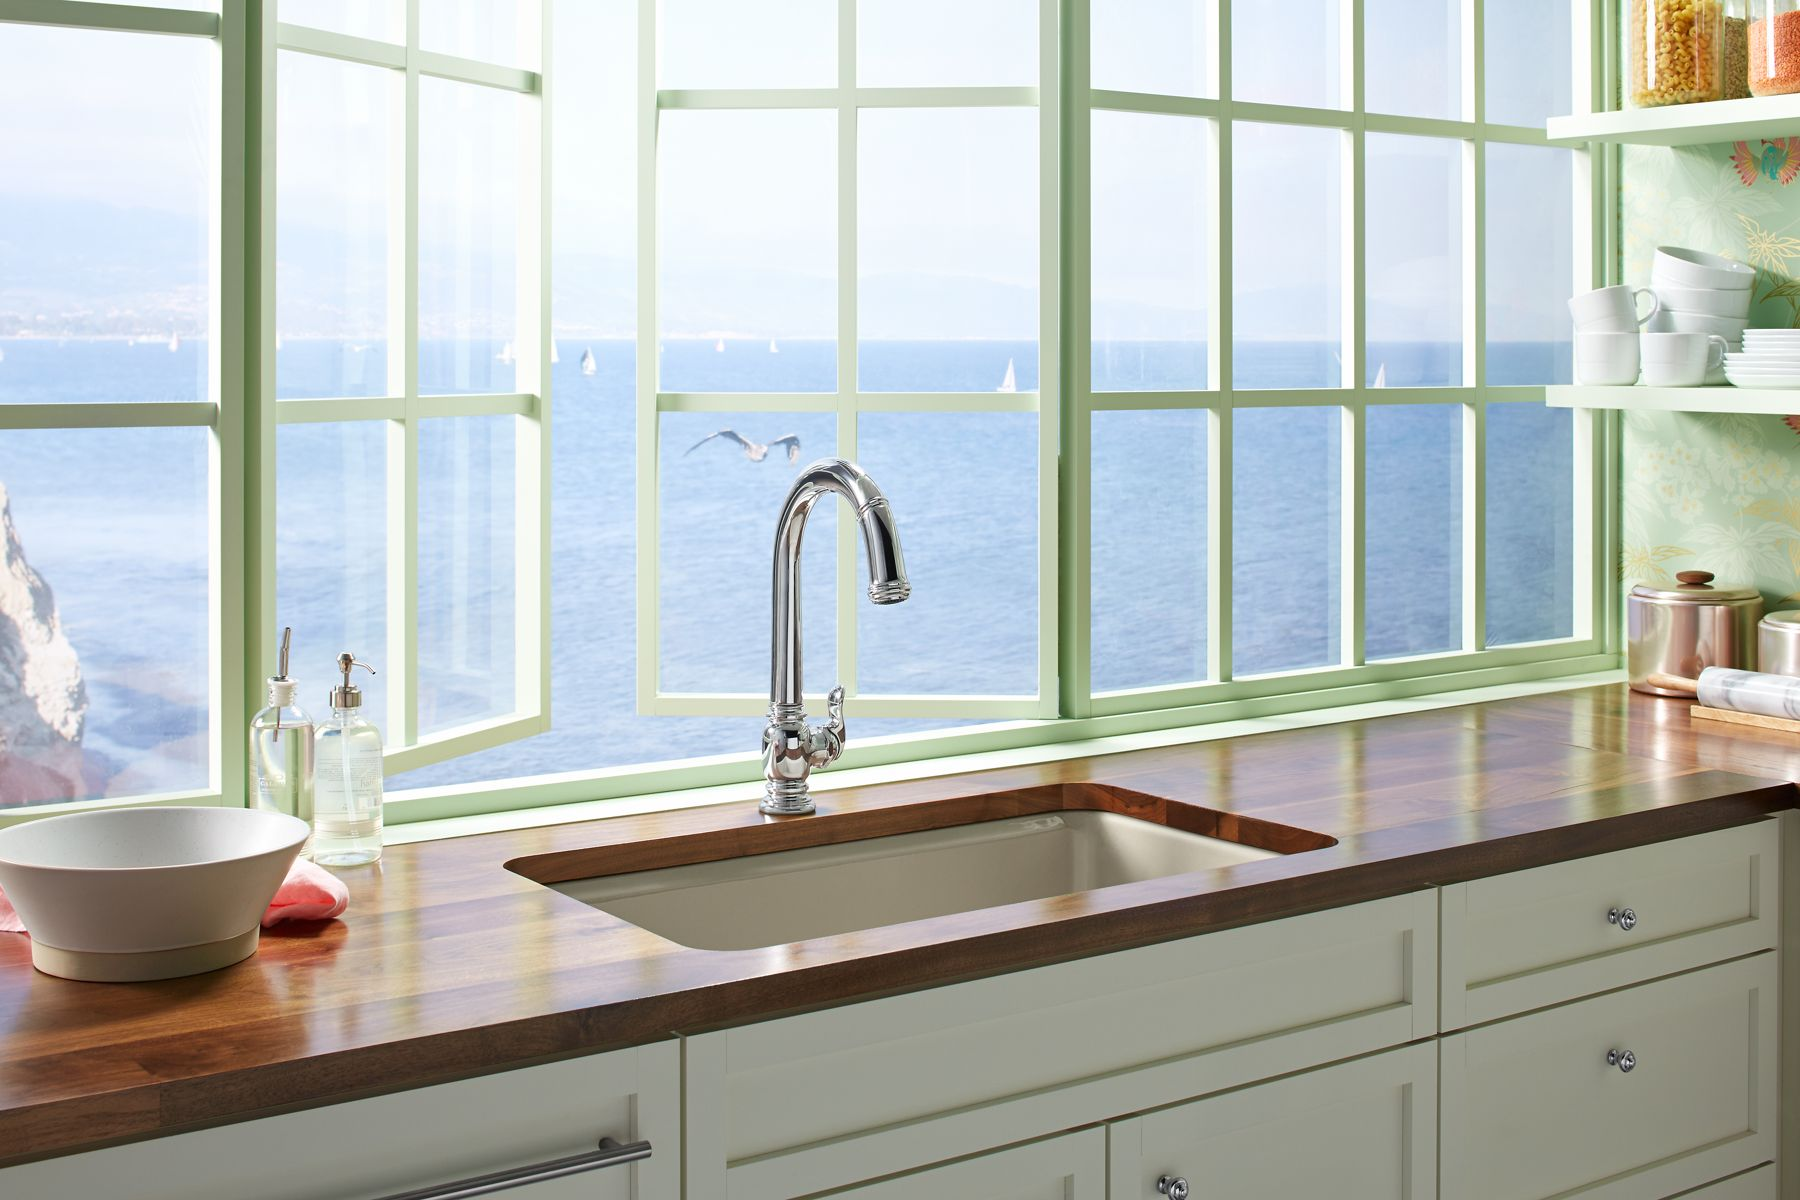 kitchen sinks buffet farmhouse stainless steel more kohler under mount